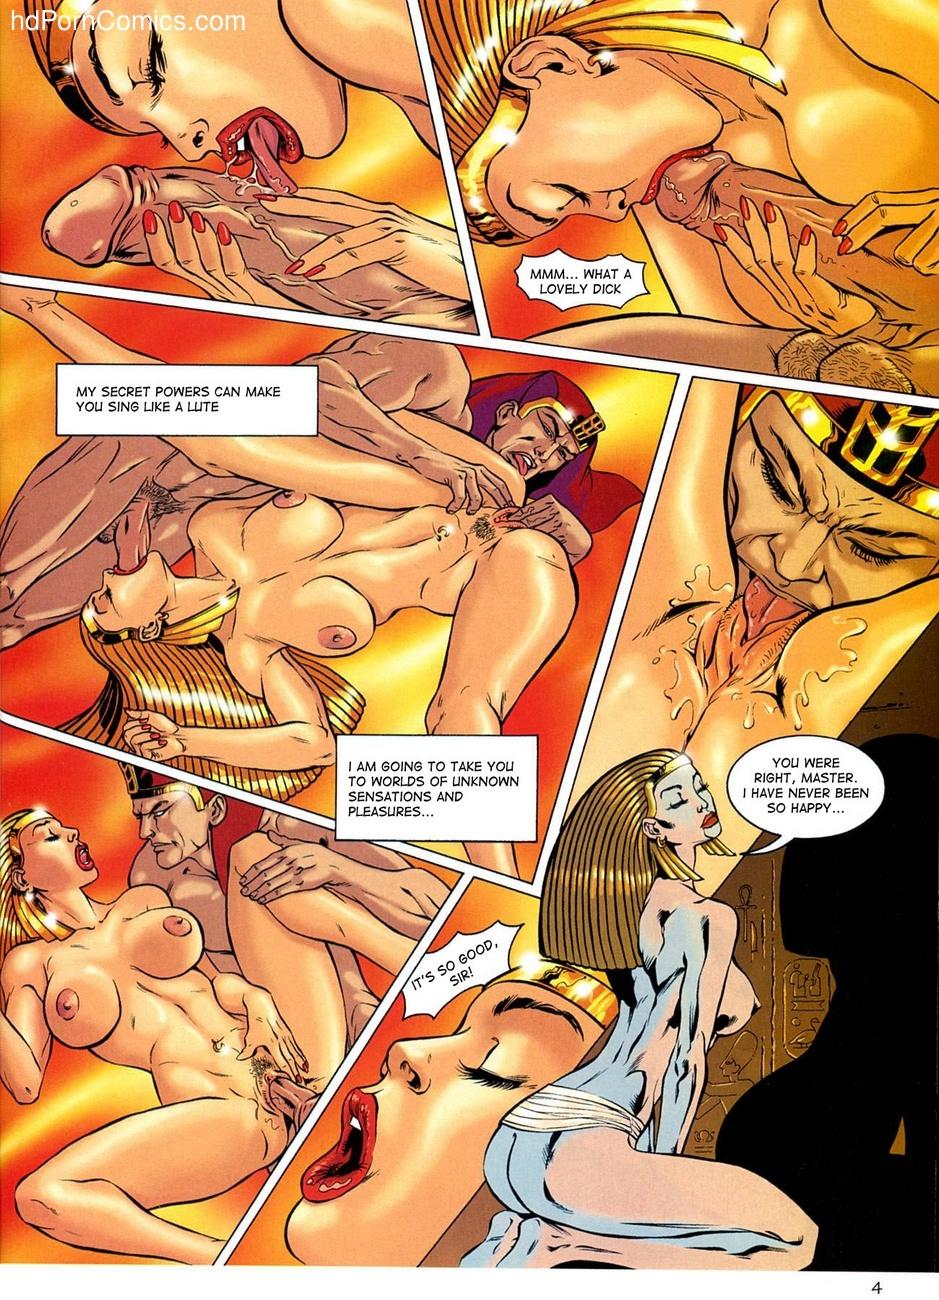 Lara Jones - The Treasure Of Osiris 5 free sex comic